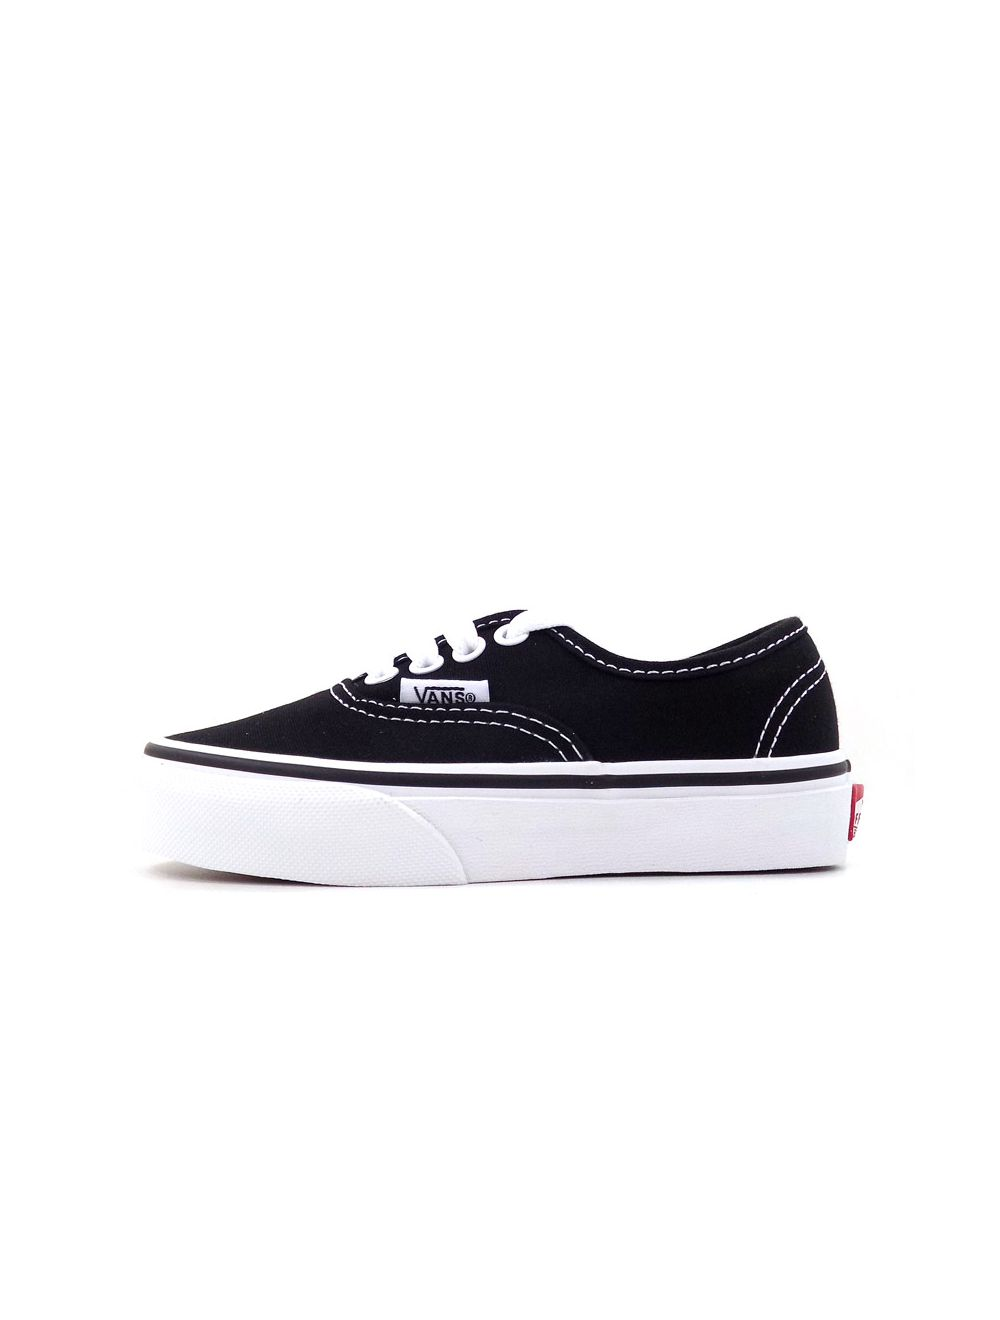 Vans Authentic Kids Sneaker Black White